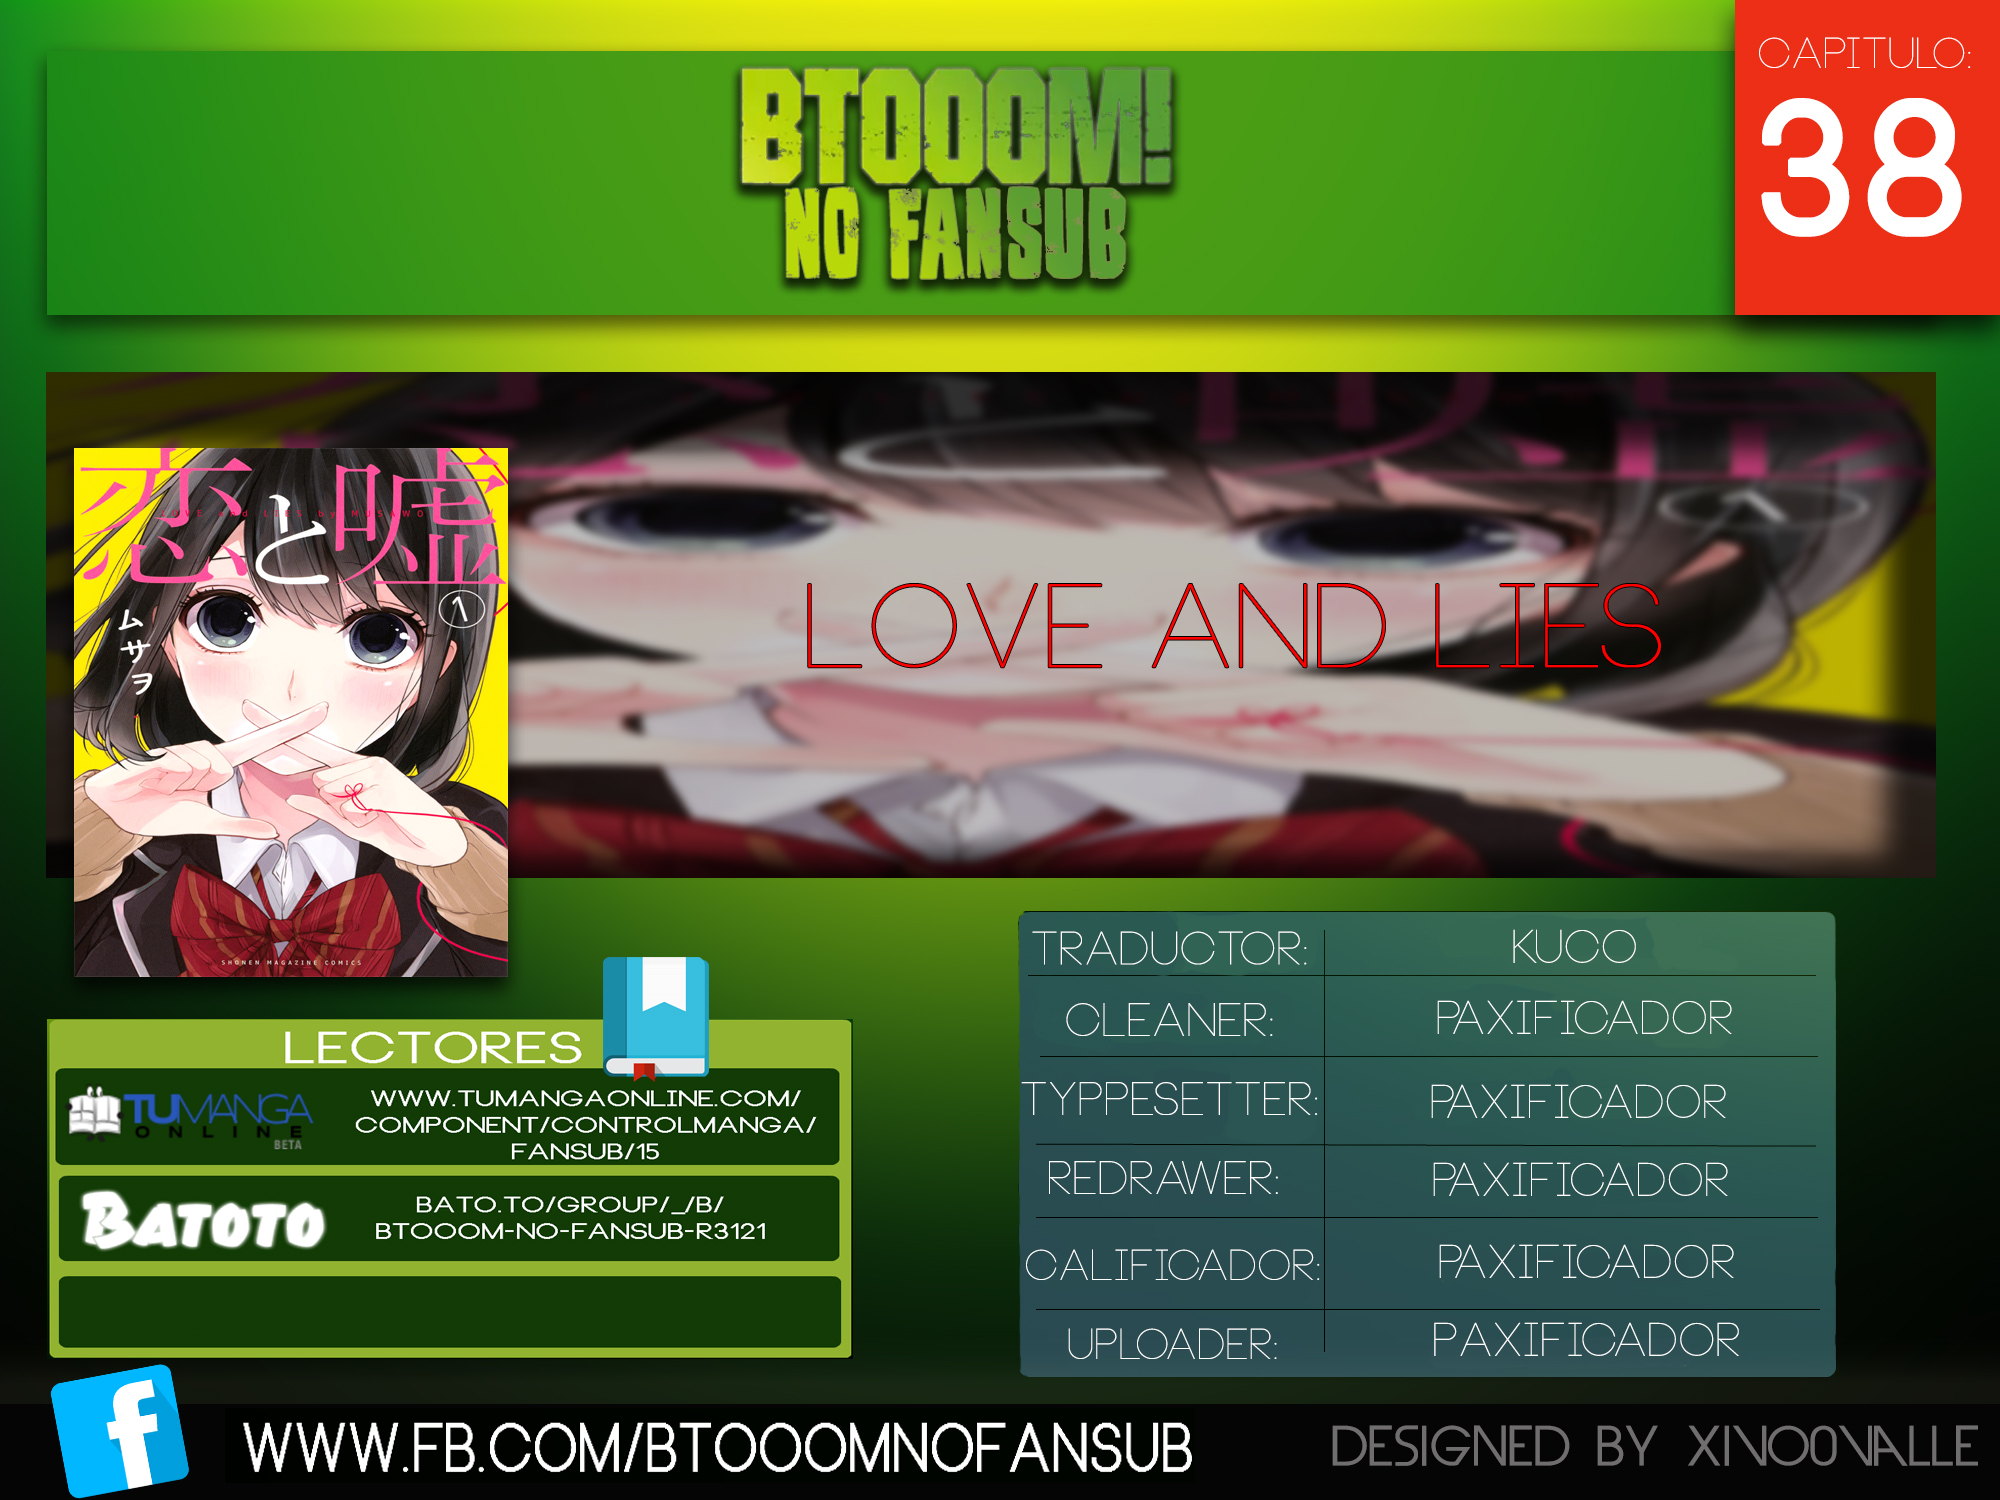 https://c5.ninemanga.com/es_manga/14/14734/383180/0e71410b90eb9a92b6375cd3b18b33ed.jpg Page 1